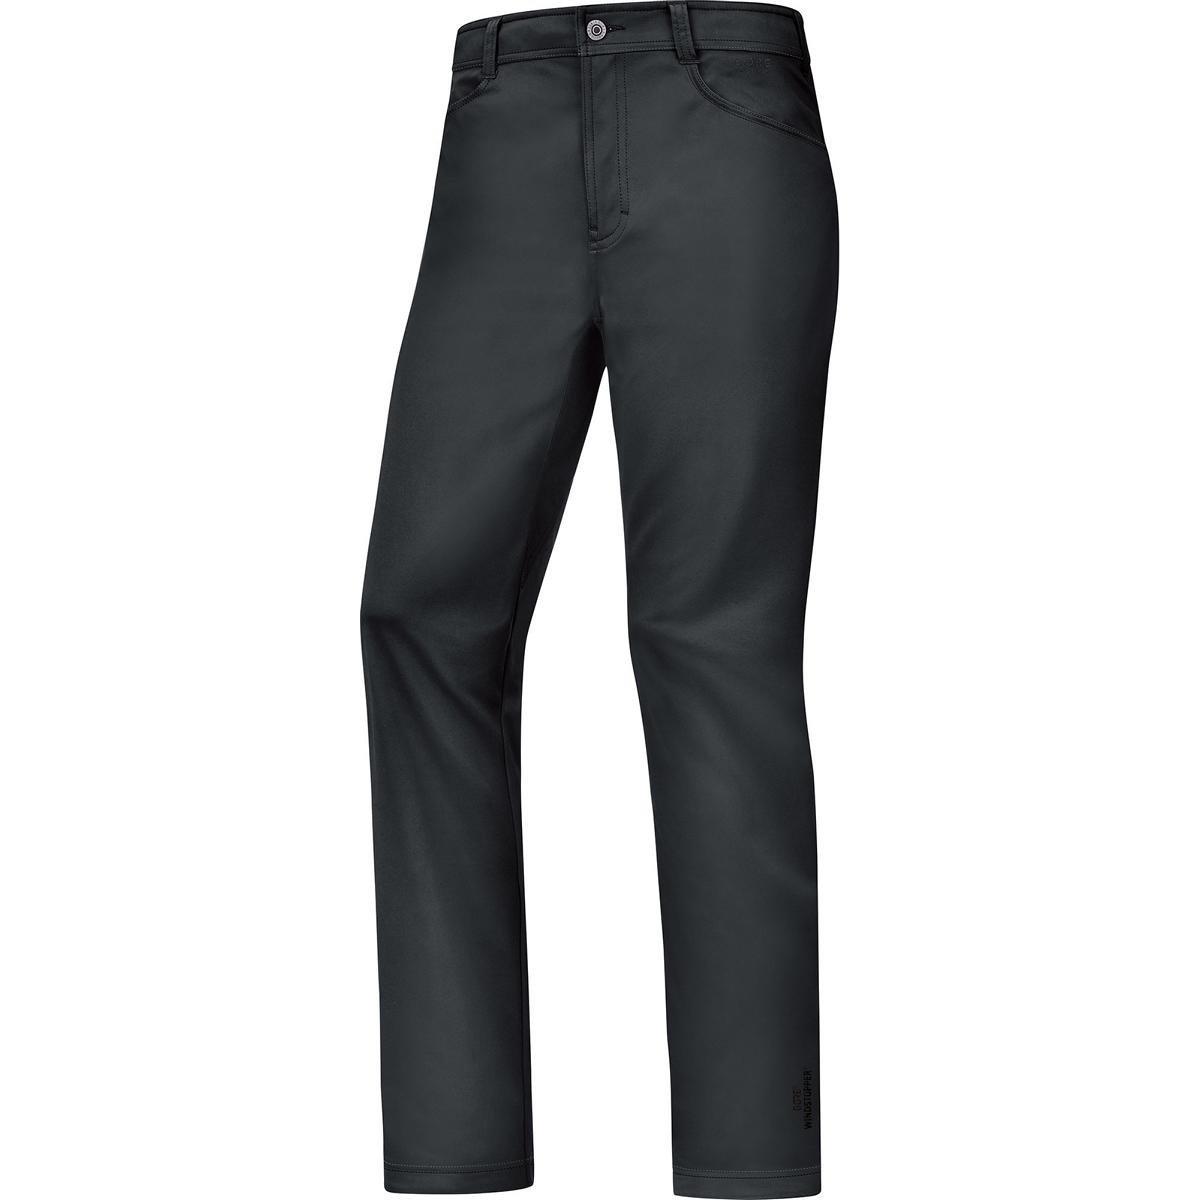 GORE WEAR Herren Hose und Shorts Lange Element Urban Print Windstopper Soft Shell Pants